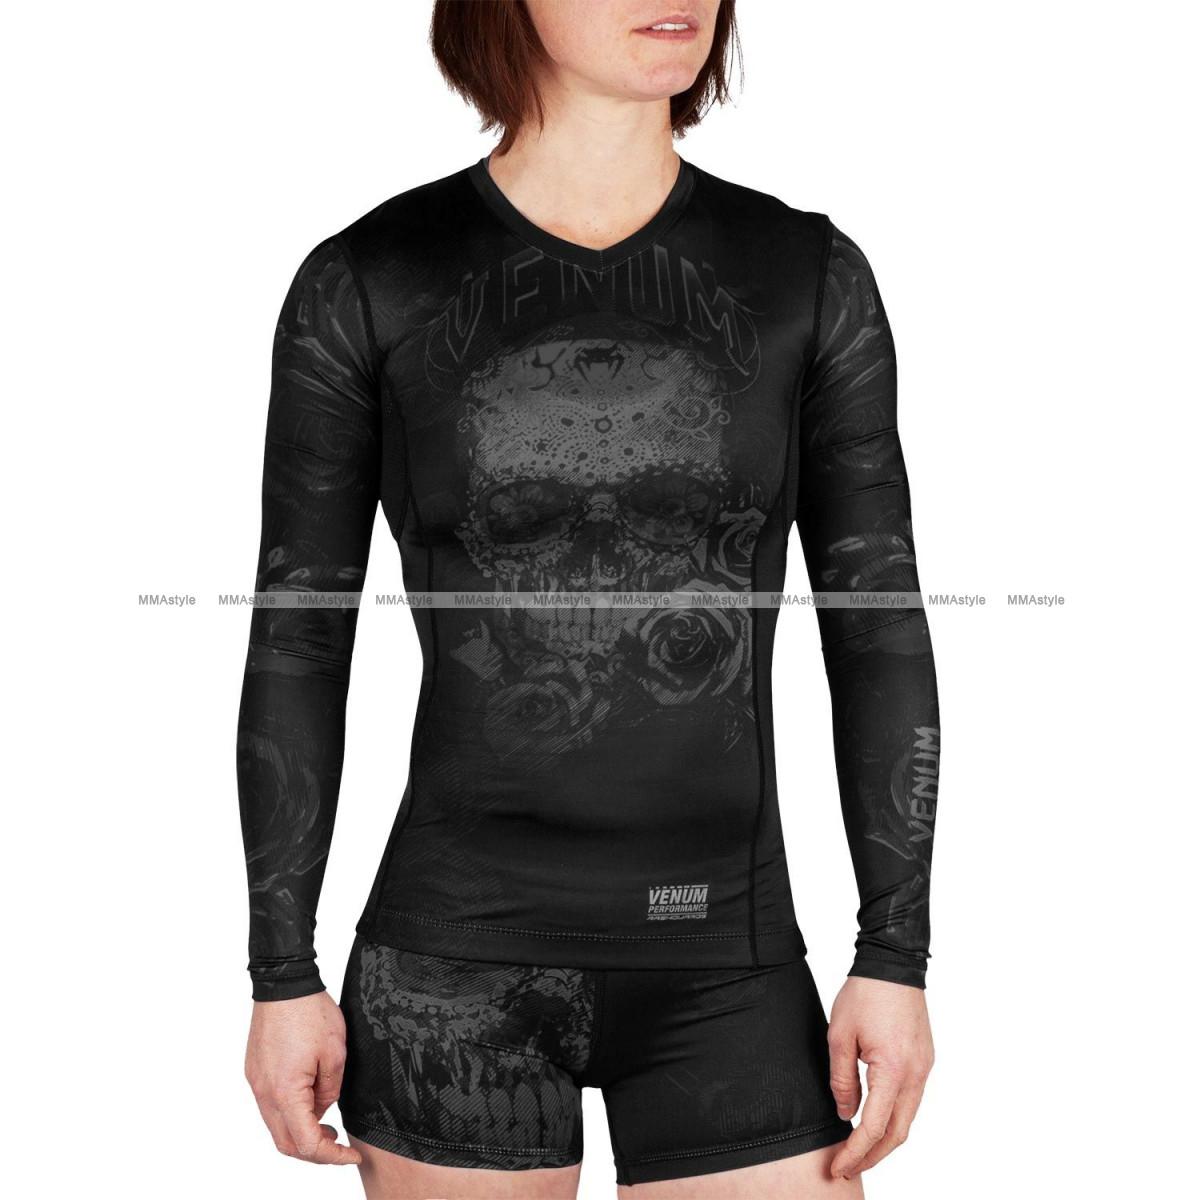 Женский рашгард Venum Santa Muerte 3.0 Long Sleeves Rashguard Black Black For Women